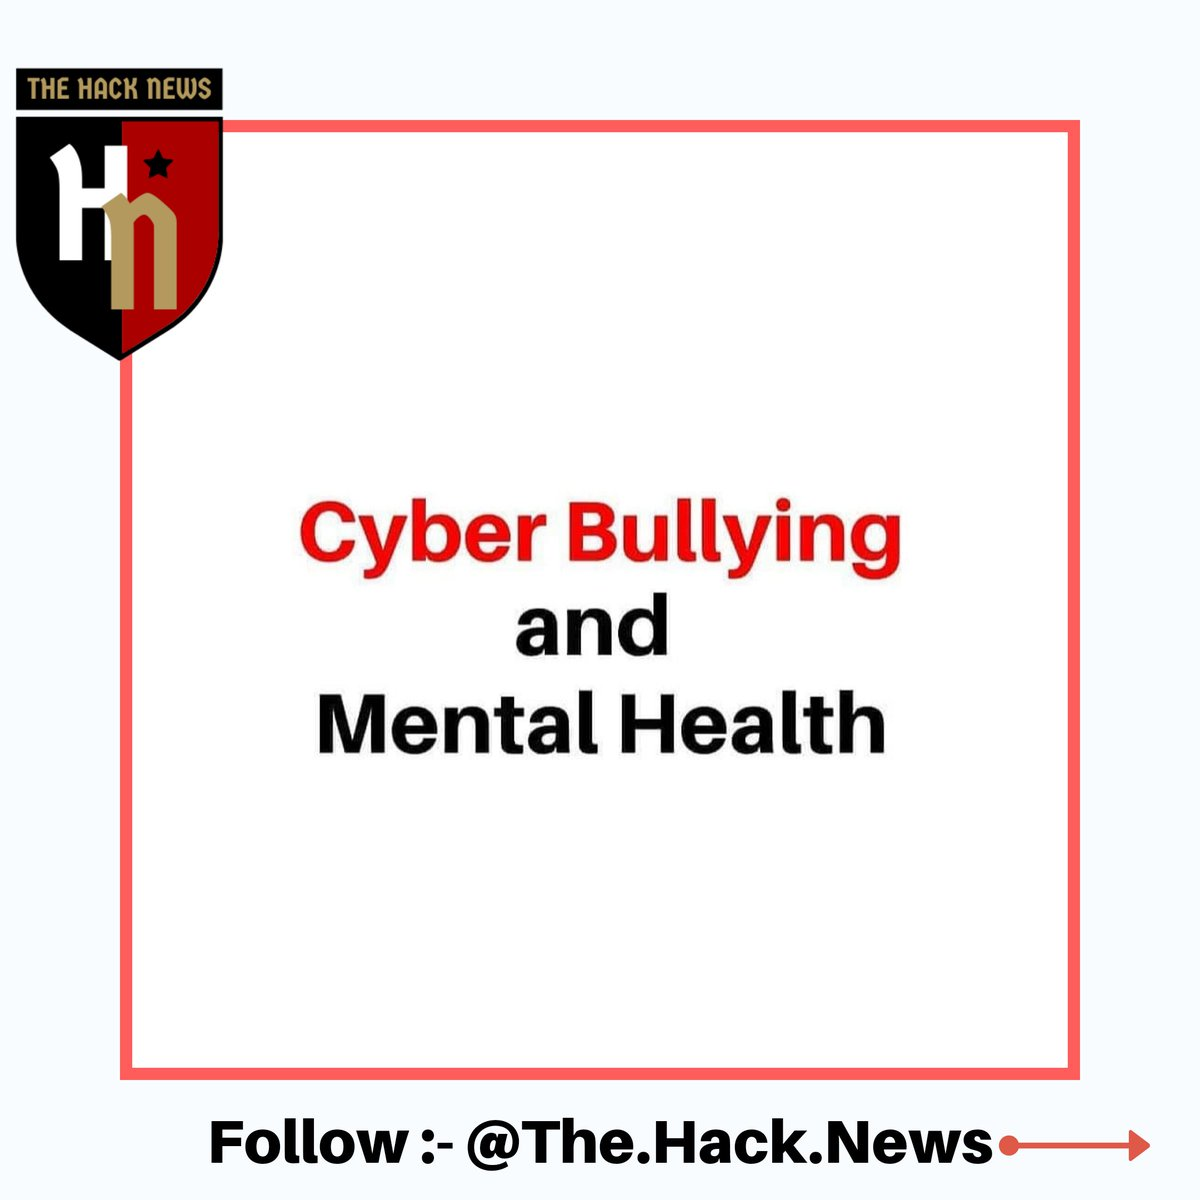 Cyber Bullying & Mental Health  Tags  #cyberbulling #bookstagramcanada #lgbtqbooks #bookishthings #youngadultbooks #kindleunlimited #booksofinsta #cybercorner #cybersecurity #cyber #bullingershepherds #bullingles #bulling #woocommerce #cybervibe #codinglife #marketingplan #hackerpic.twitter.com/6la2dJ7IJF